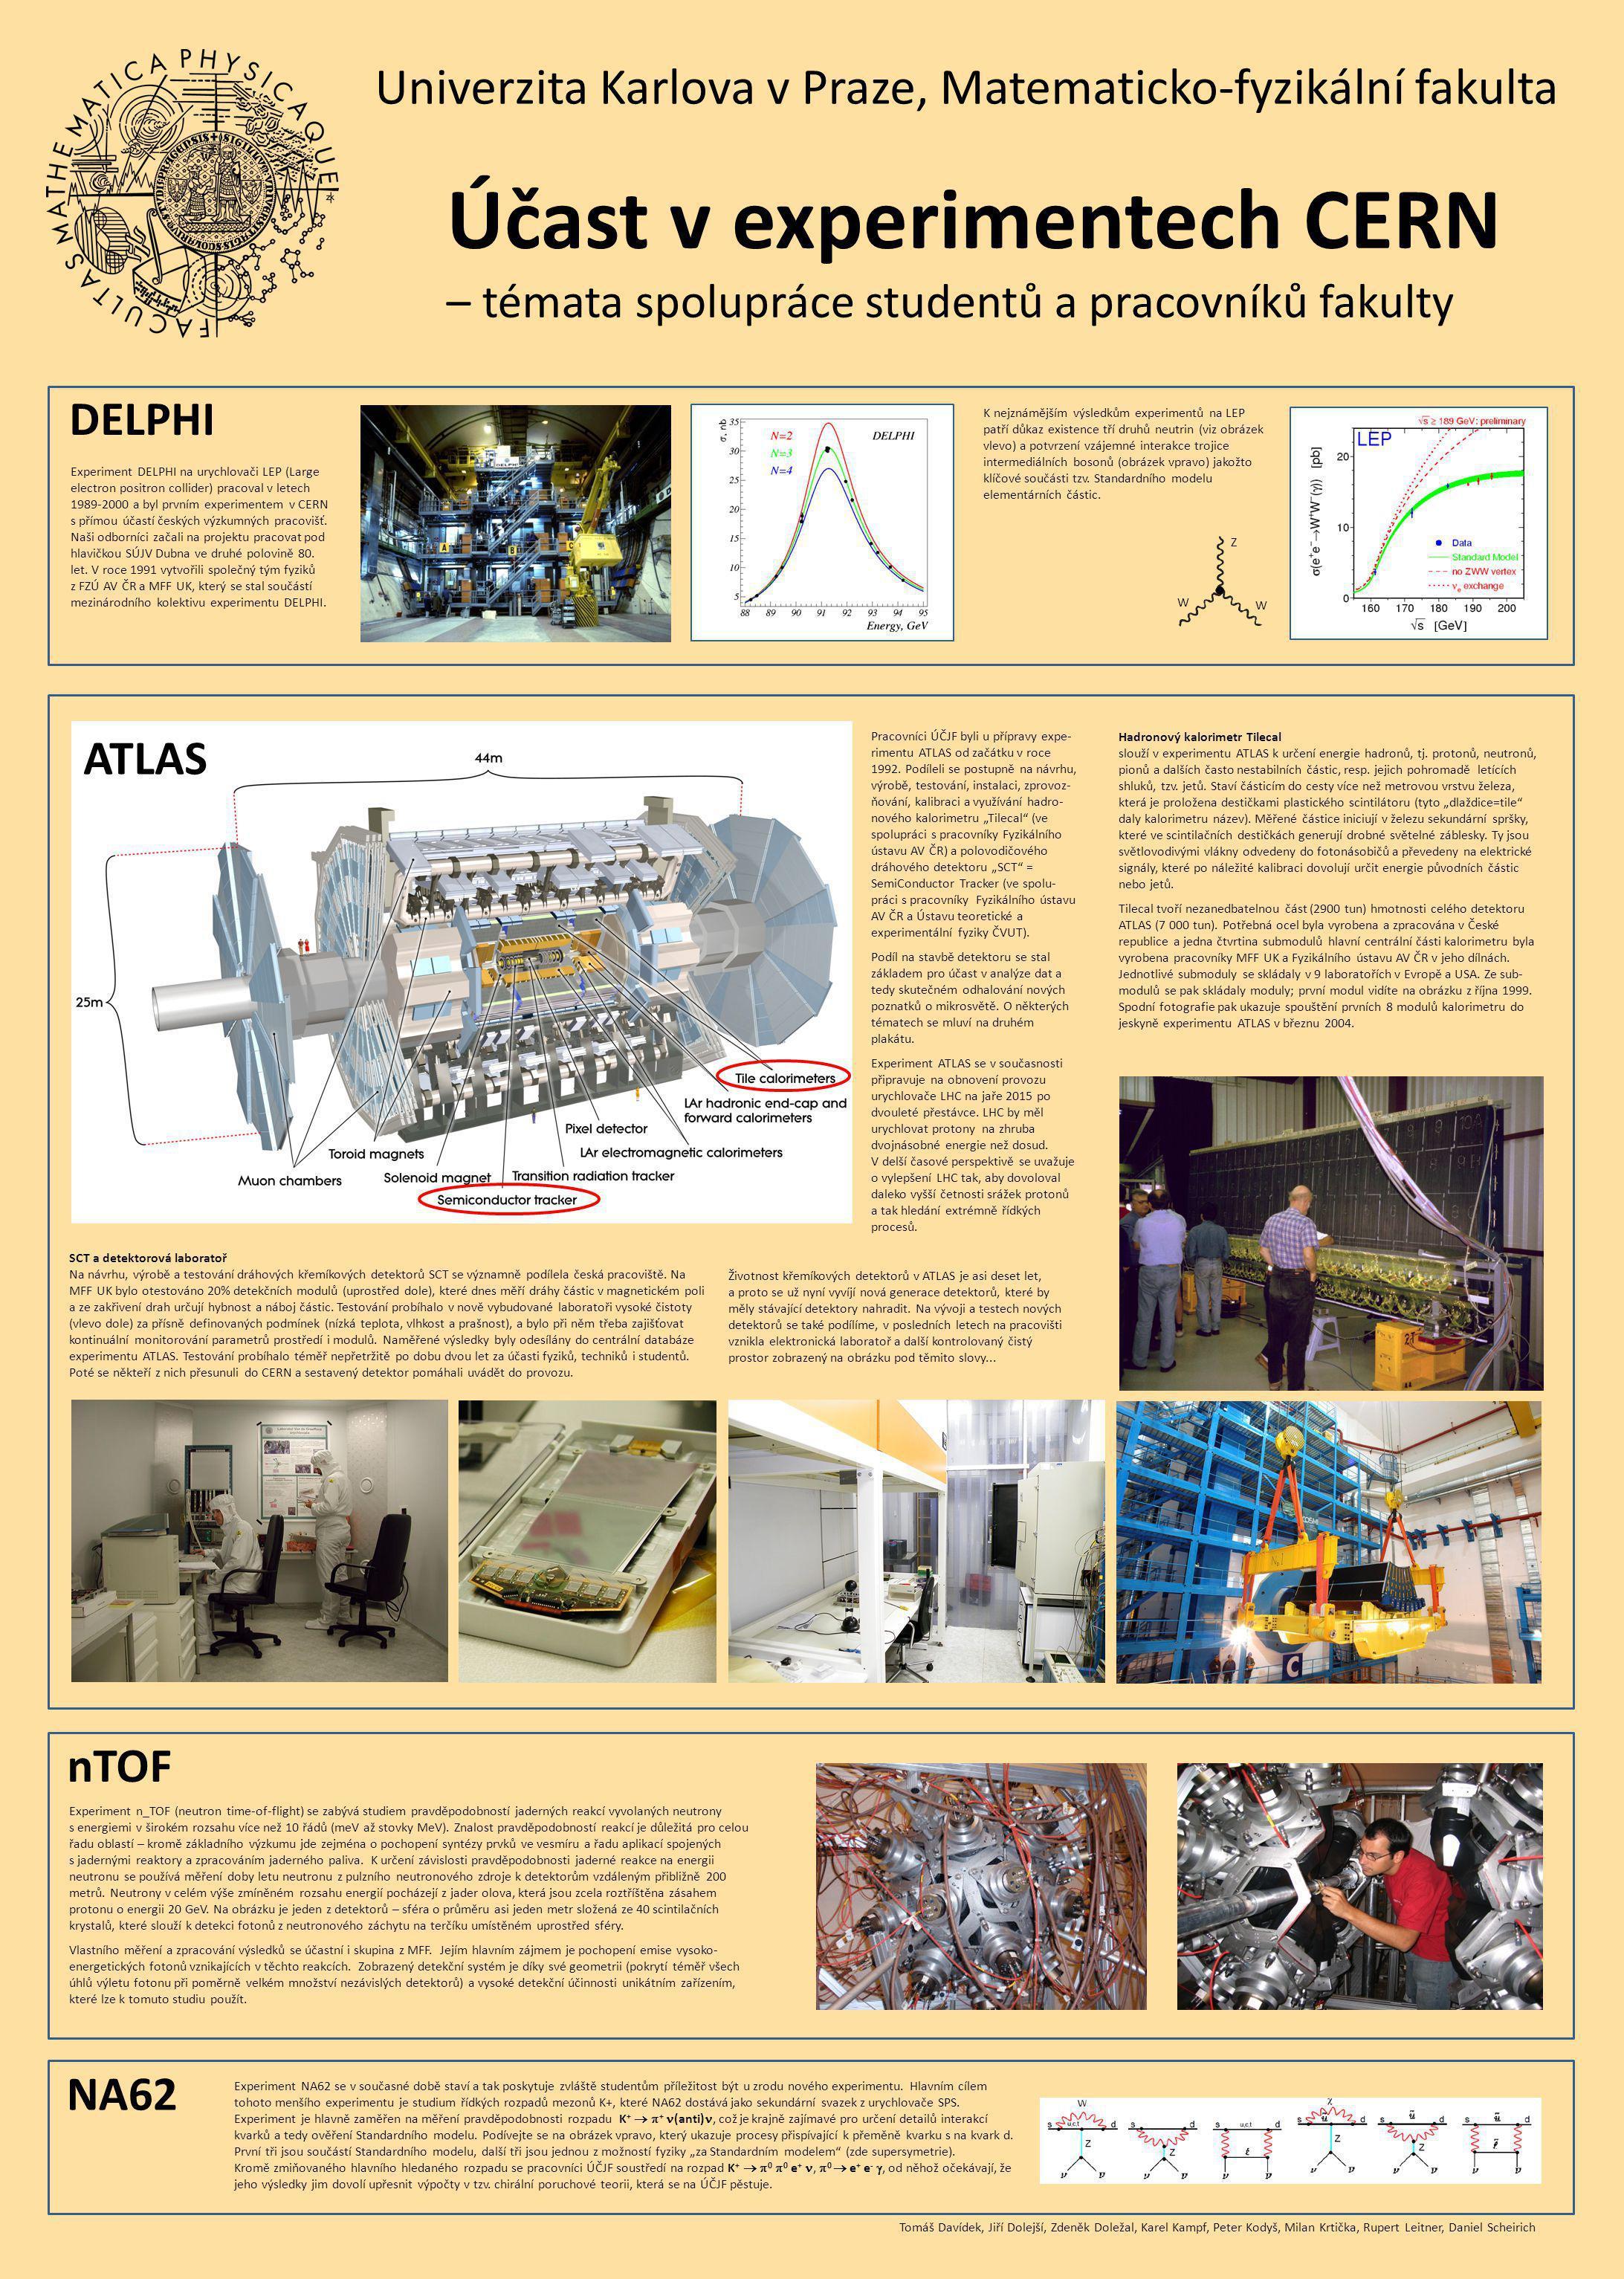 Univerzita Karlova v Praze, Matematicko-fyzikální fakulta Účast v experimentech CERN – témata spolupráce studentů a pracovníků fakulty NA62 DELPHI ATLAS nTOF Experiment n_TOF (neutron time-of-flight) se zabývá studiem pravděpodobností jaderných reakcí vyvolaných neutrony s energiemi v širokém rozsahu více než 10 řádů (meV až stovky MeV).